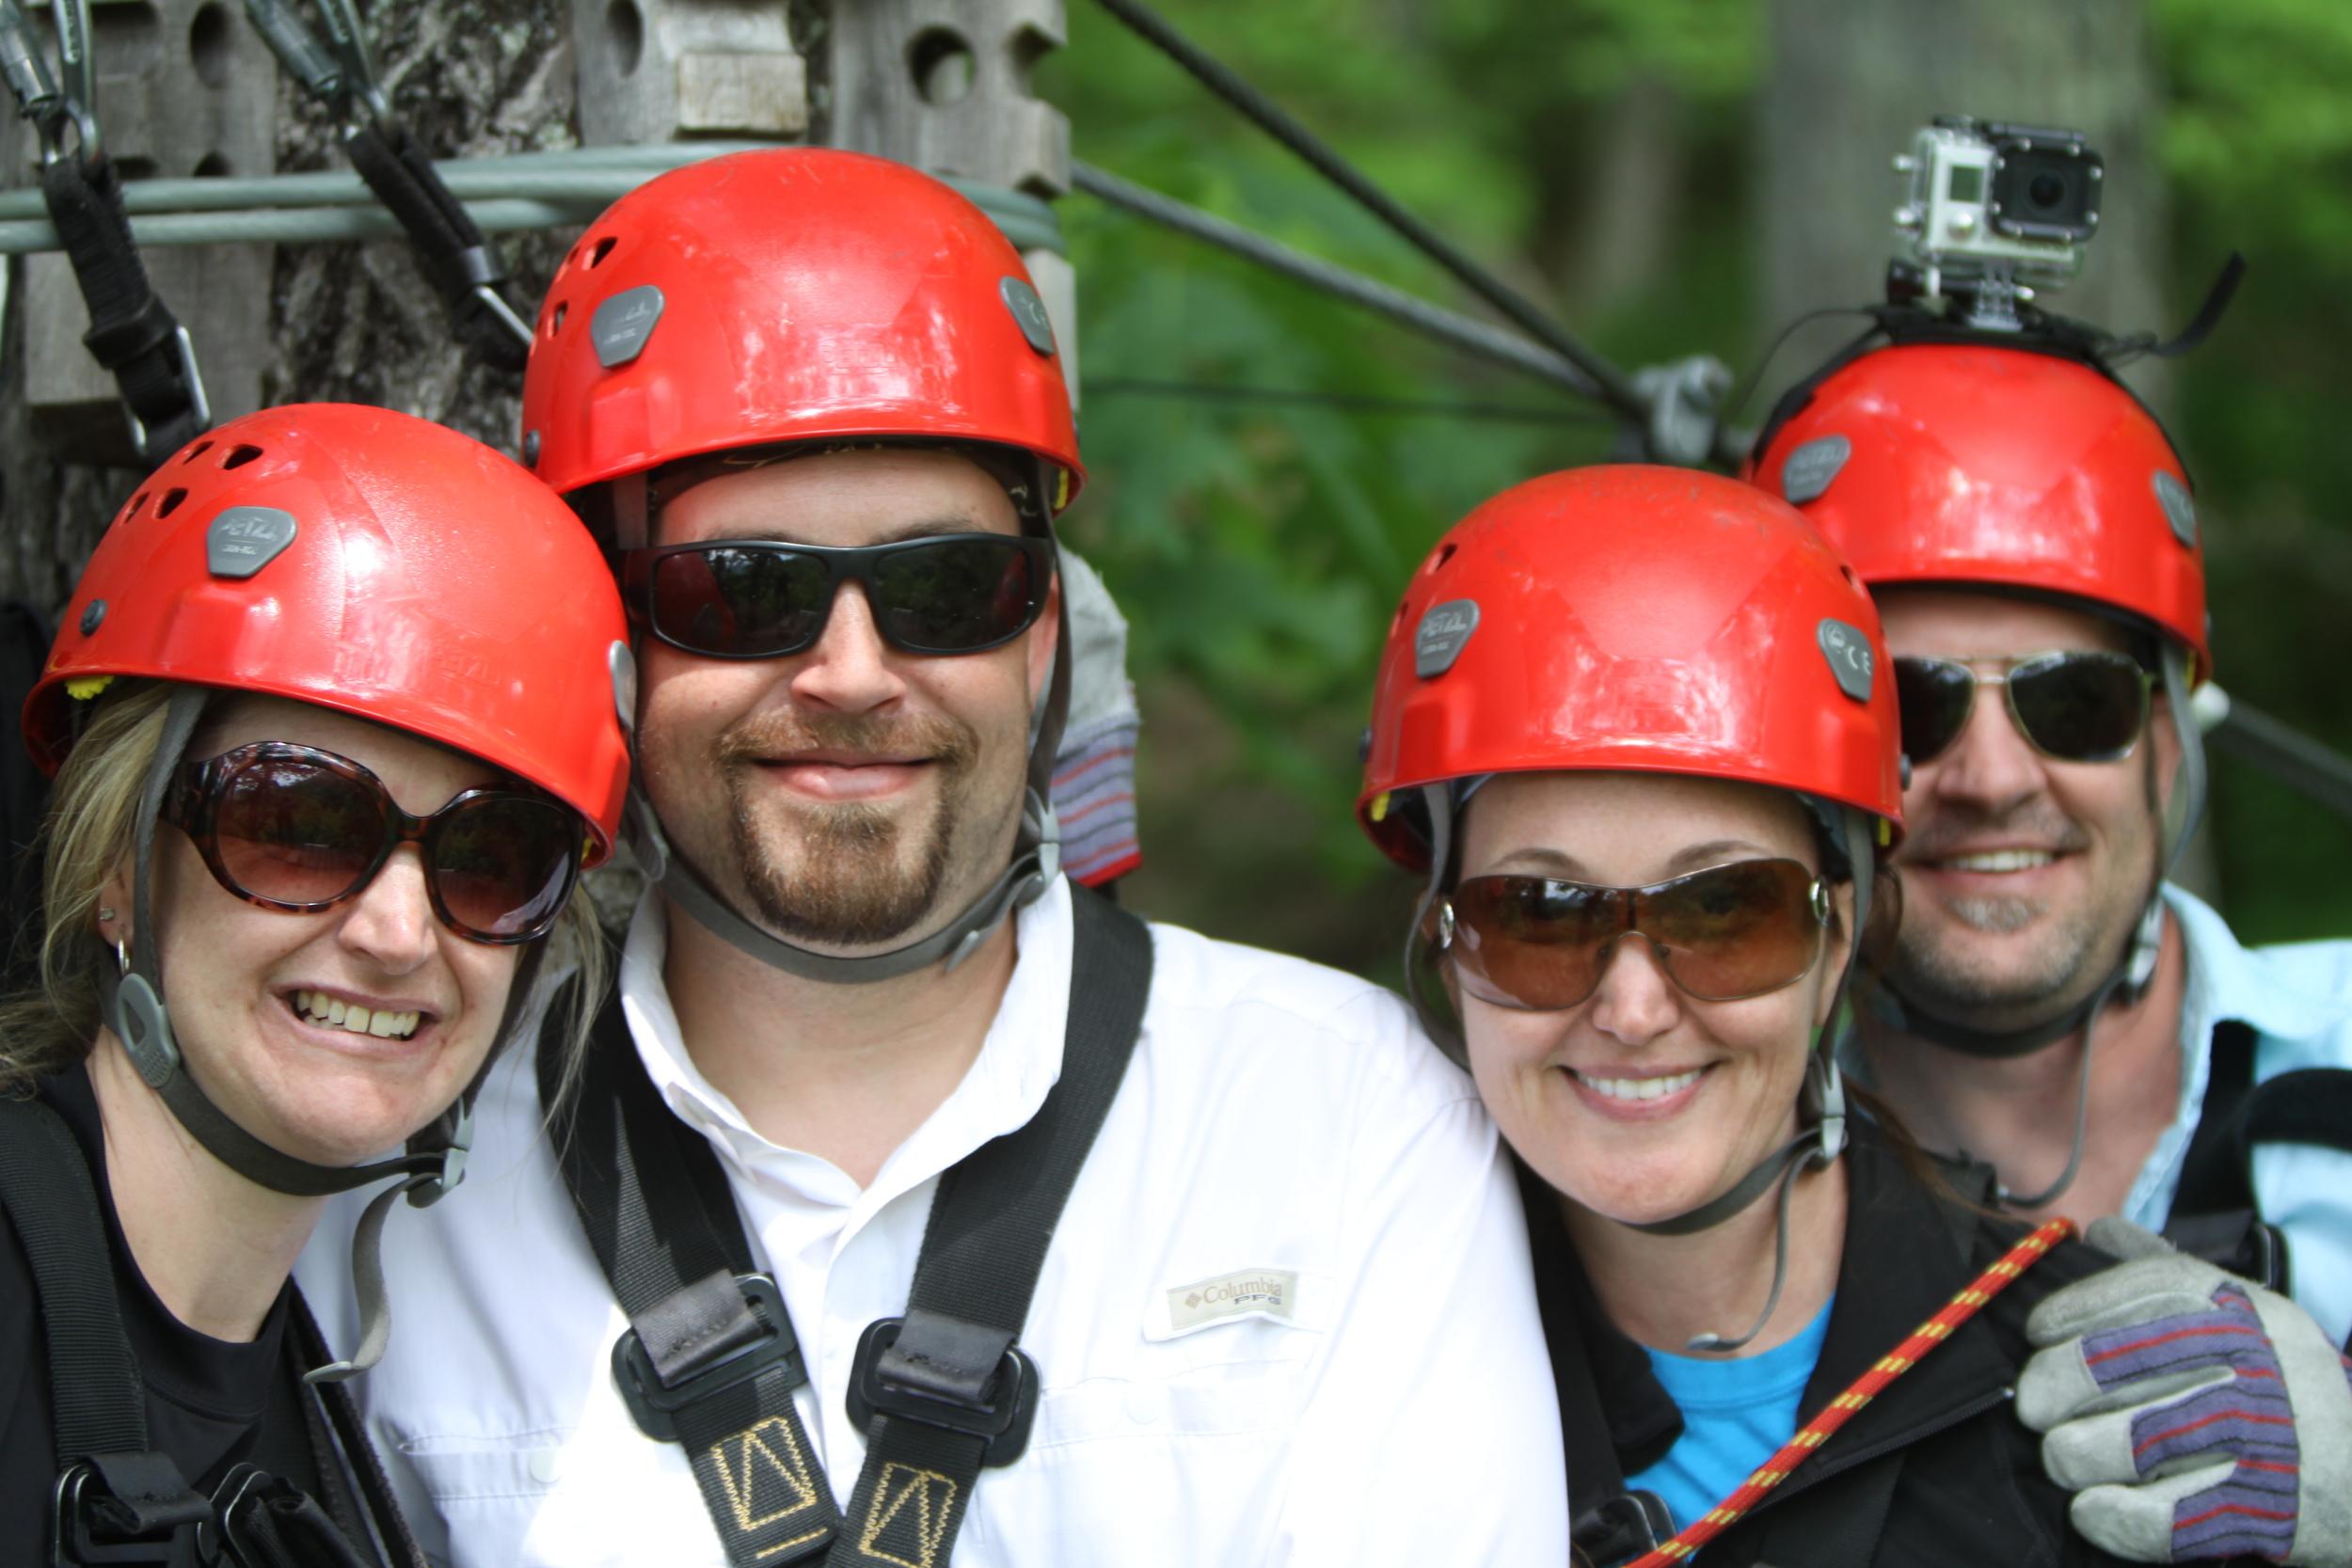 The Crew zip lining at Navitat